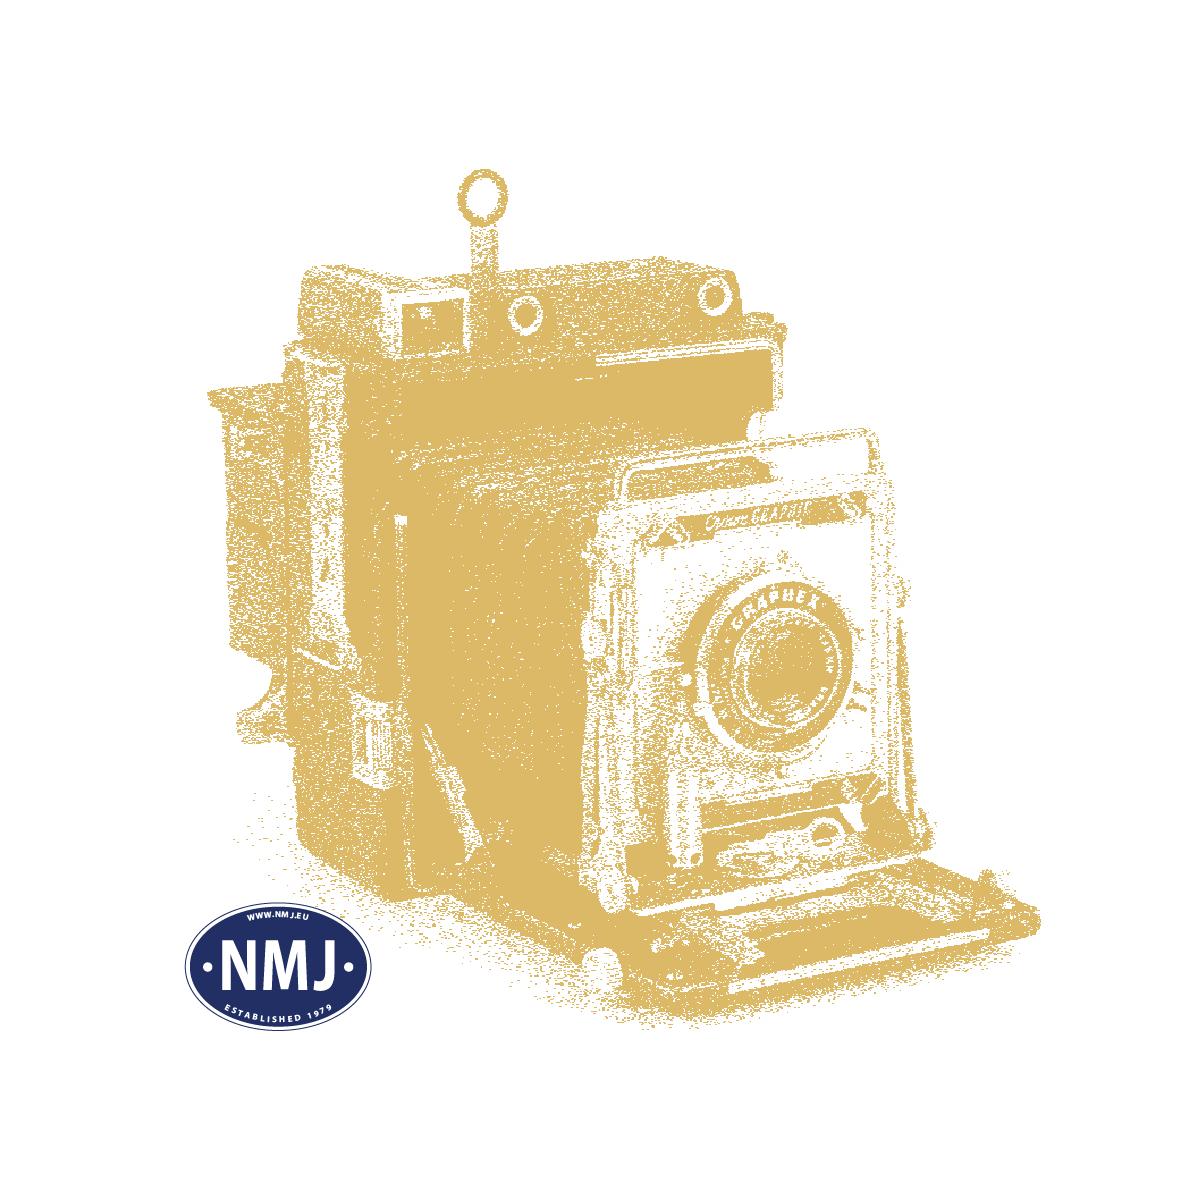 NMJT502.107 - NMJ Topline Kbps 21 76 335 3 871-5 Rungenwagen der NSB m/ Holzladung